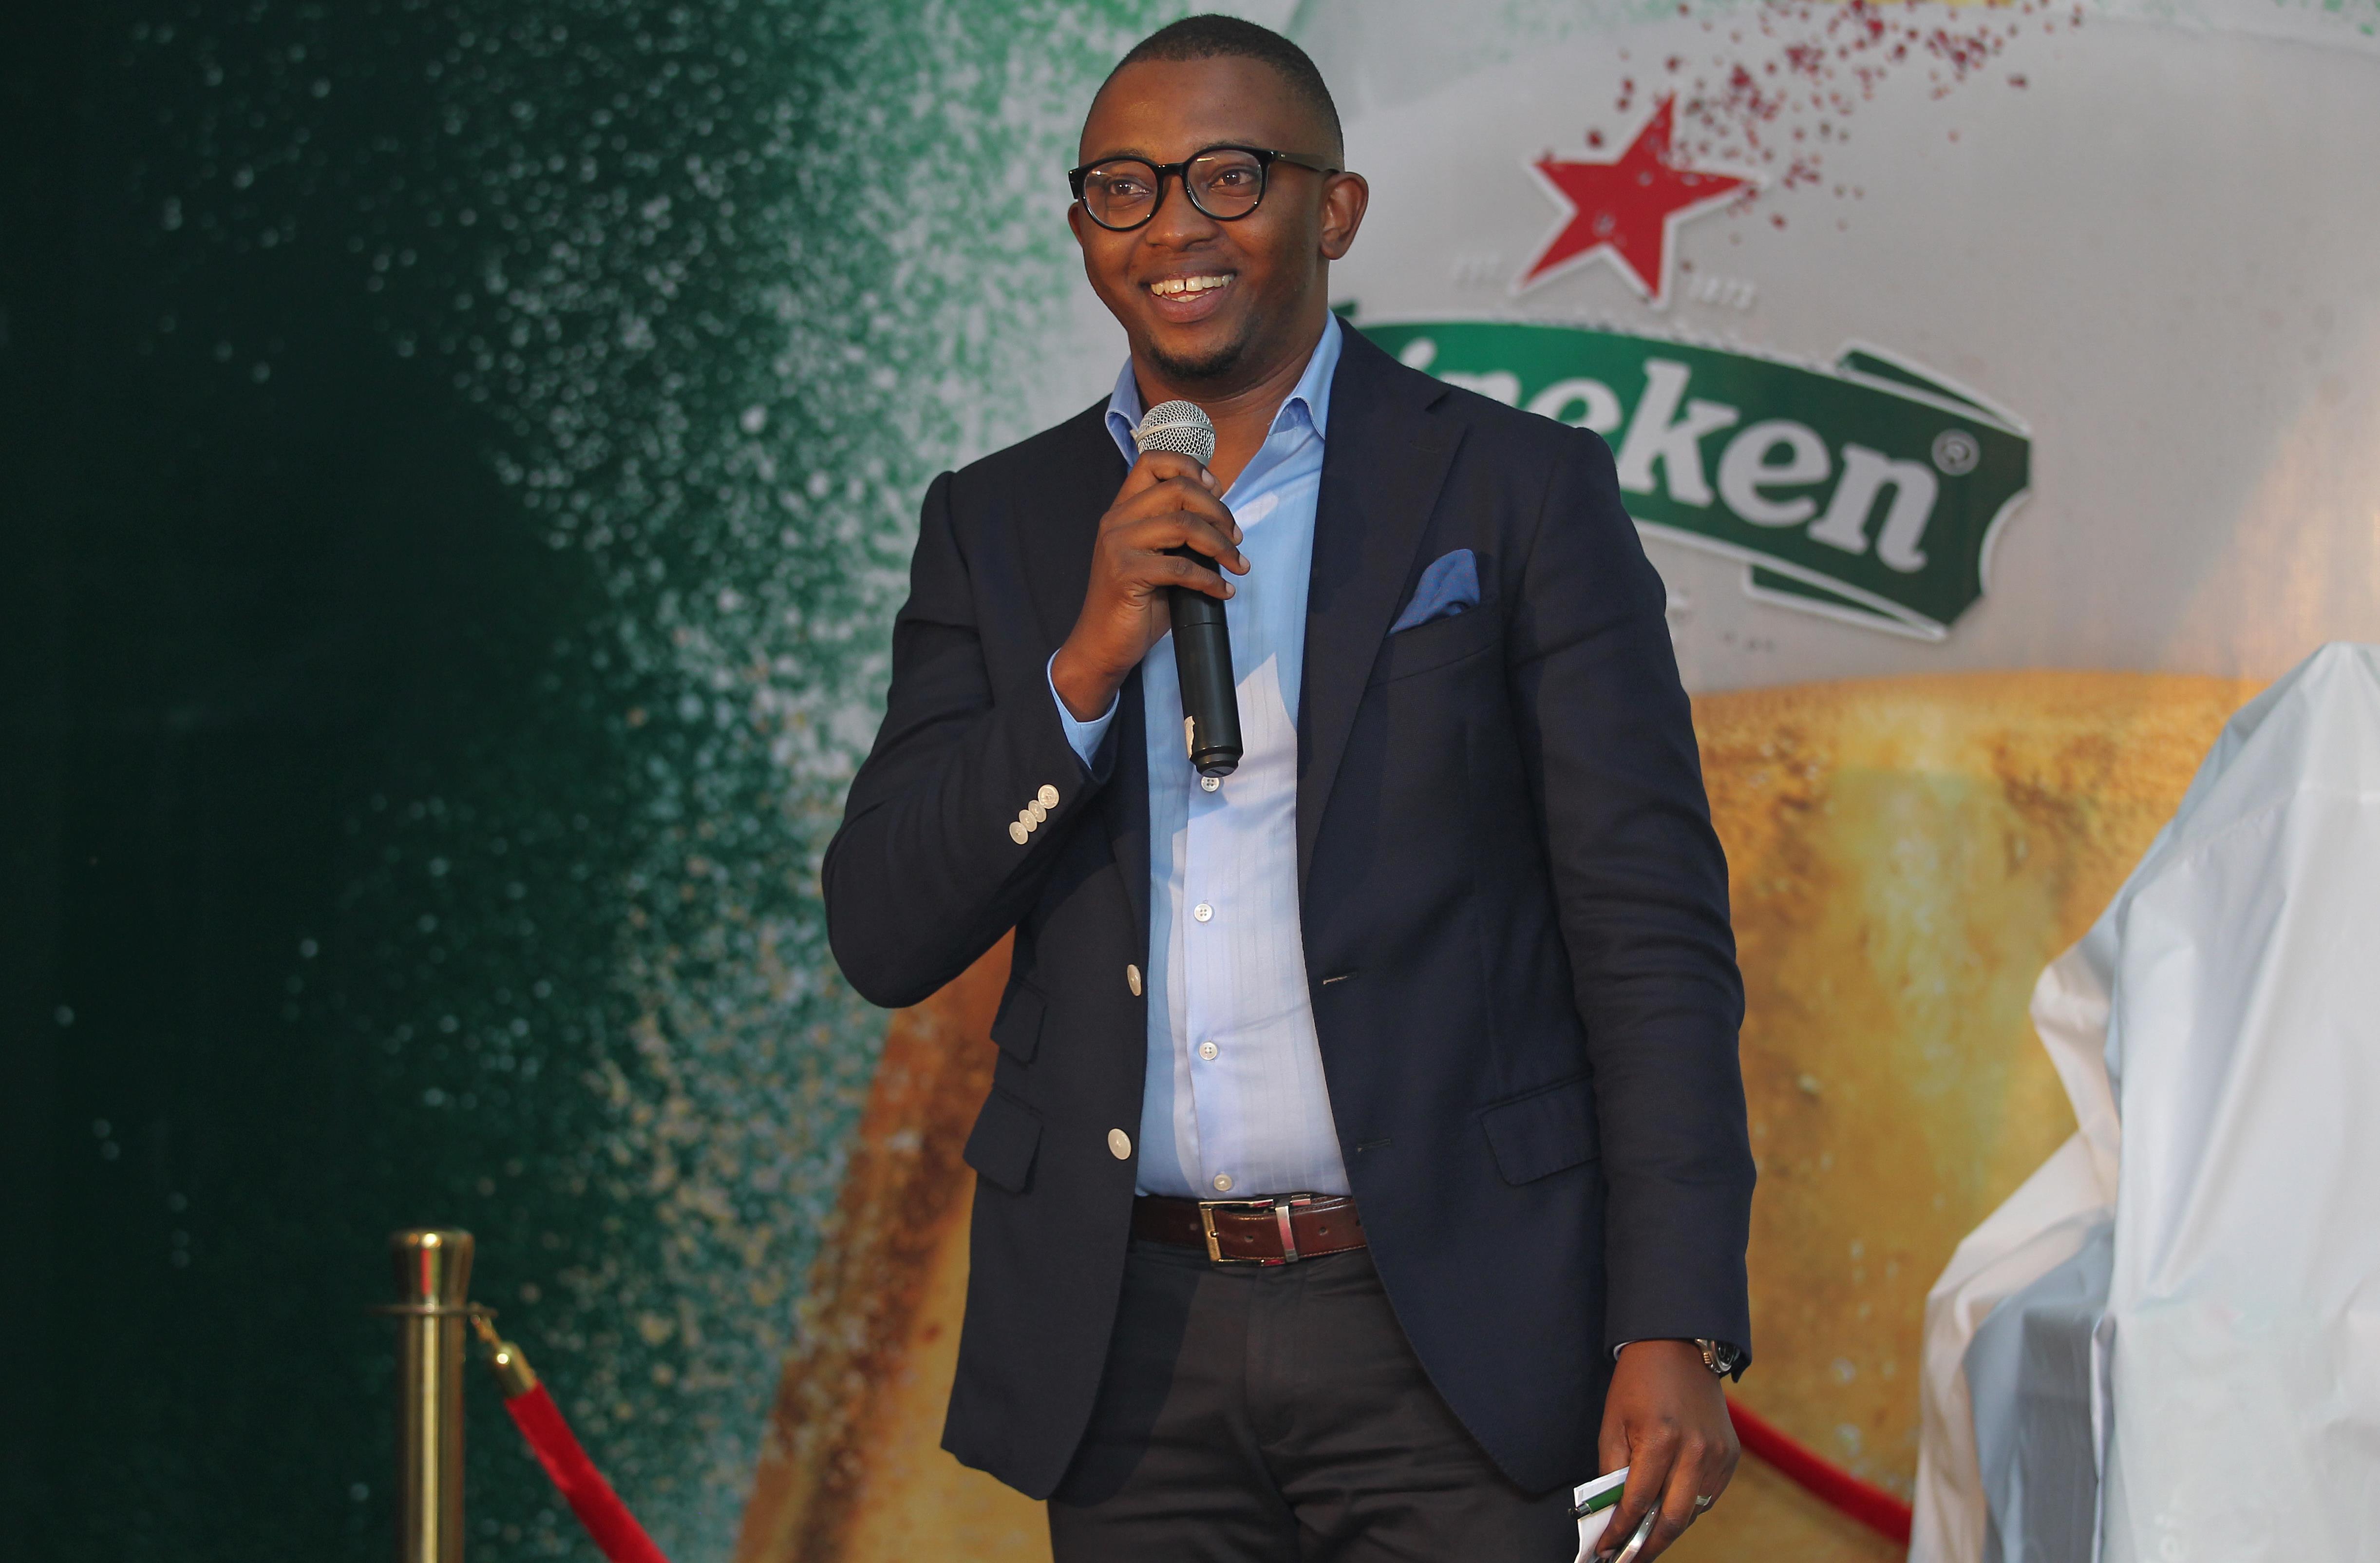 Heineken Country Manager Kenya Michael Mbungu speaks during the event